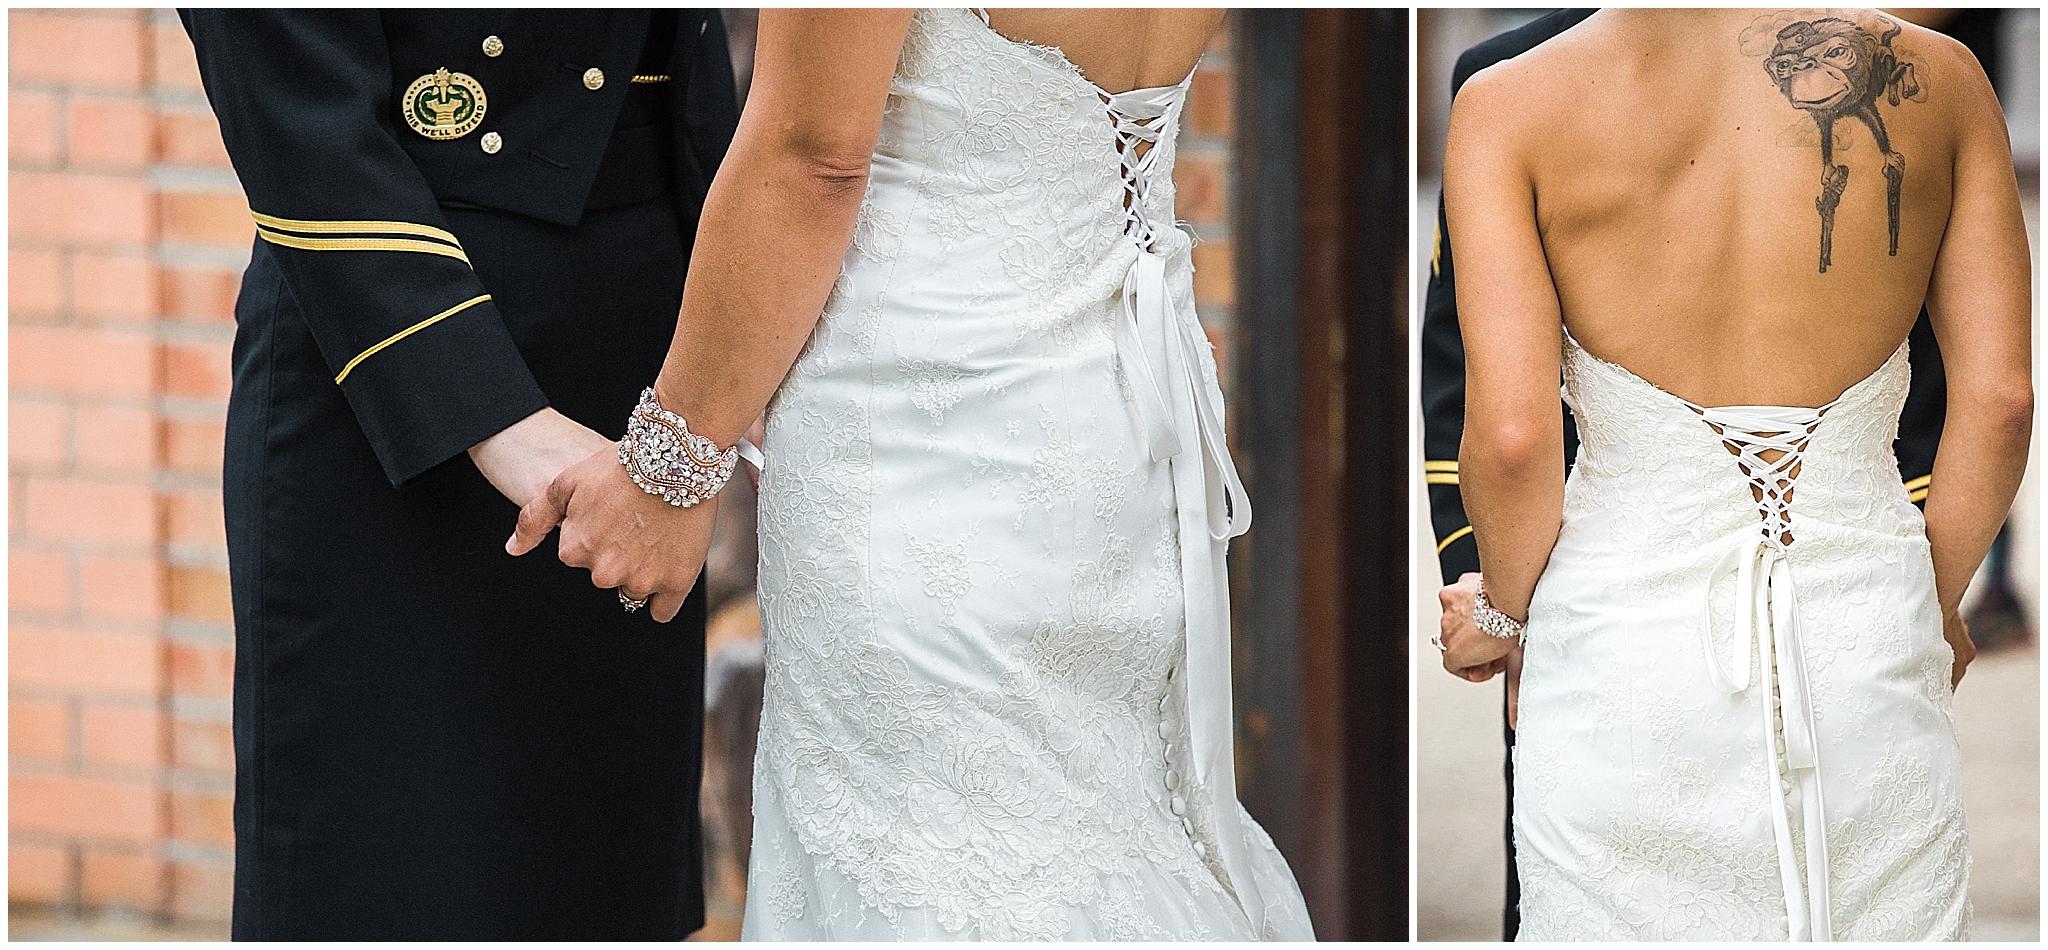 Wedding_Asheville_Highland_Brewing_Photographer_6.jpg